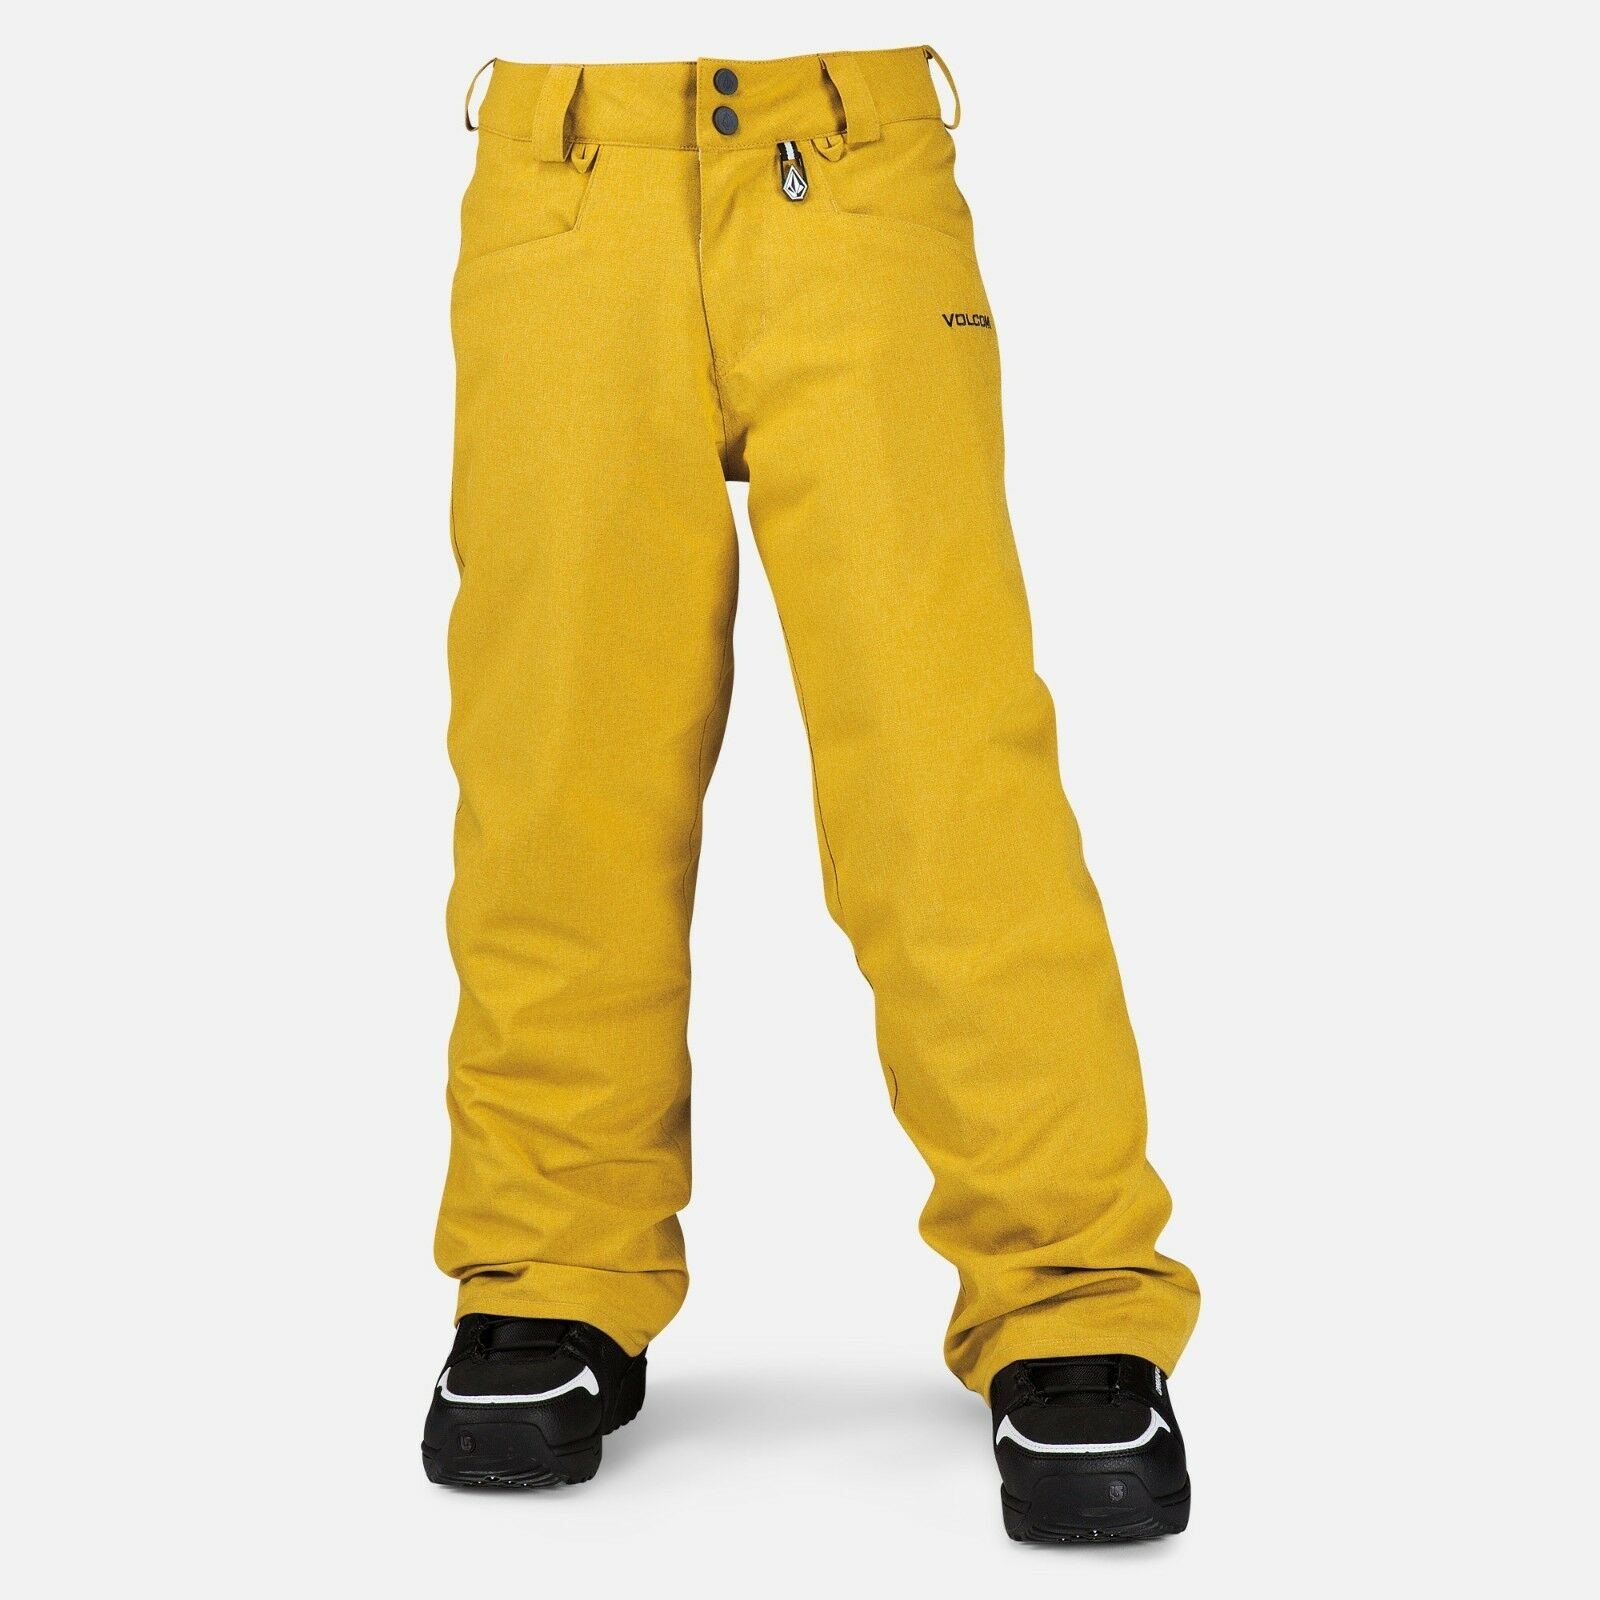 2015 NWT BOYS VOLCOM LEGEND INSULATED SNOWBOARD PANTS  110 M bronze gold yellow